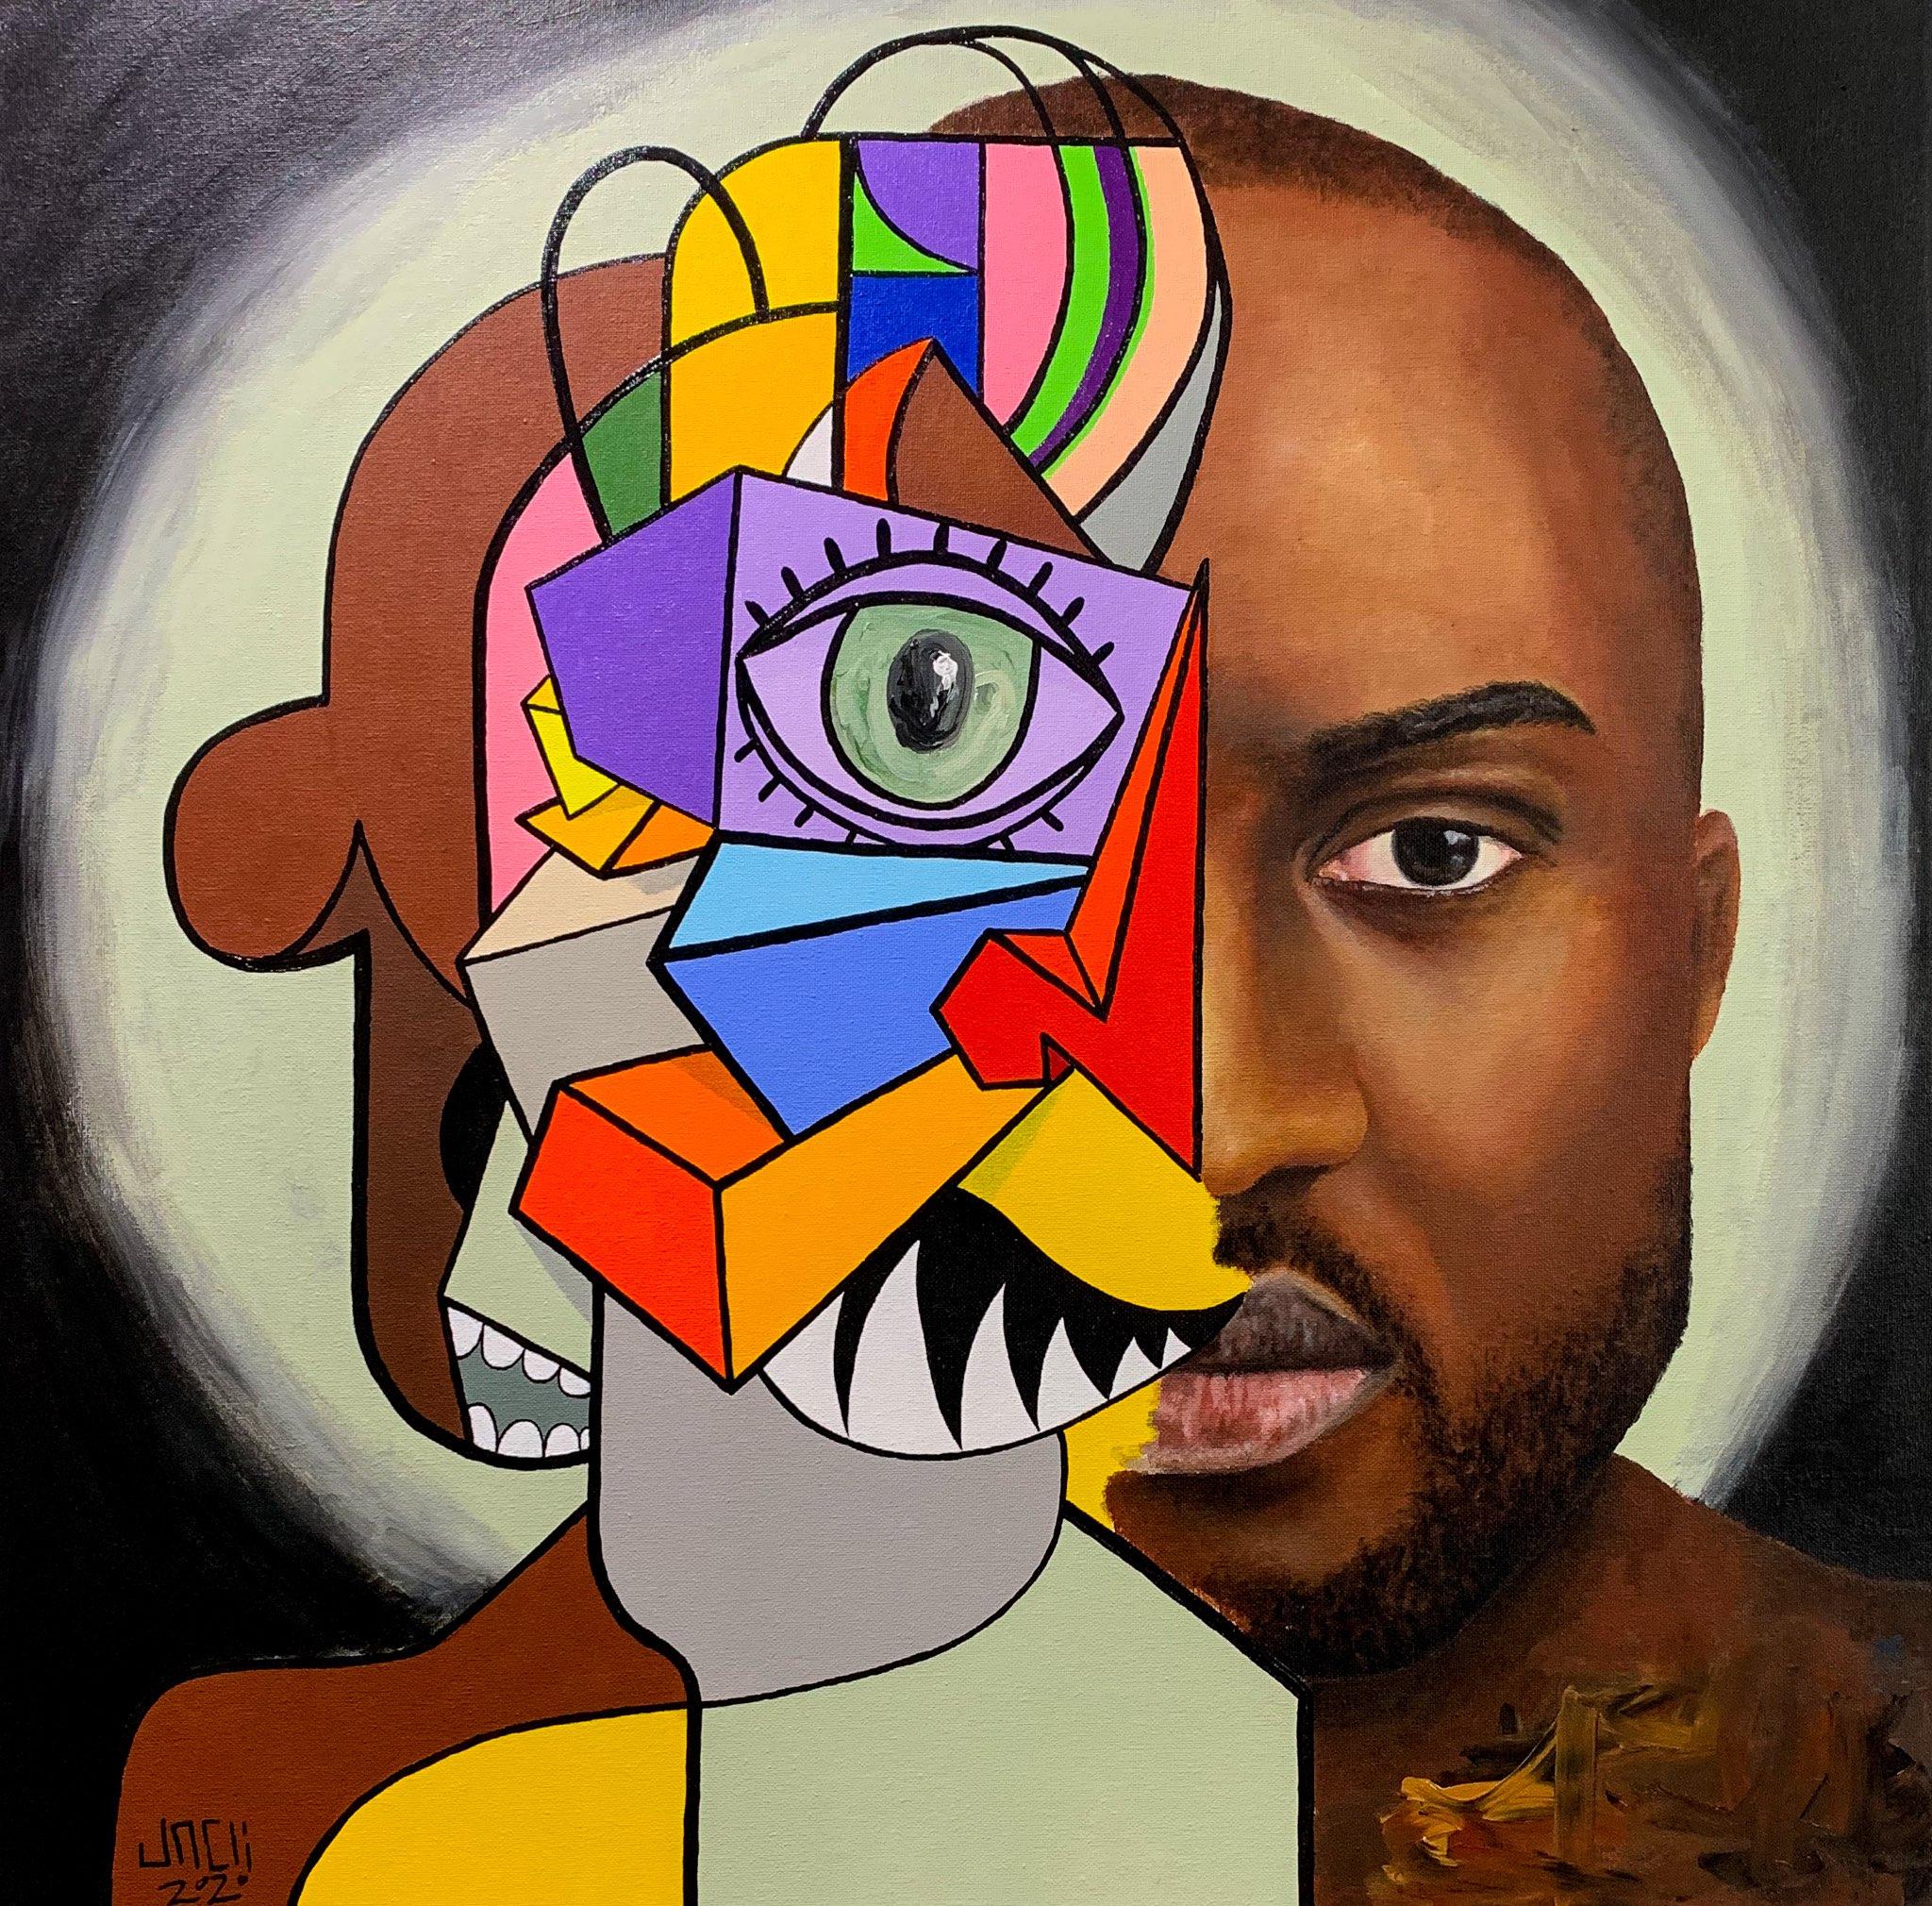 Human Head: Virgil Abloh model